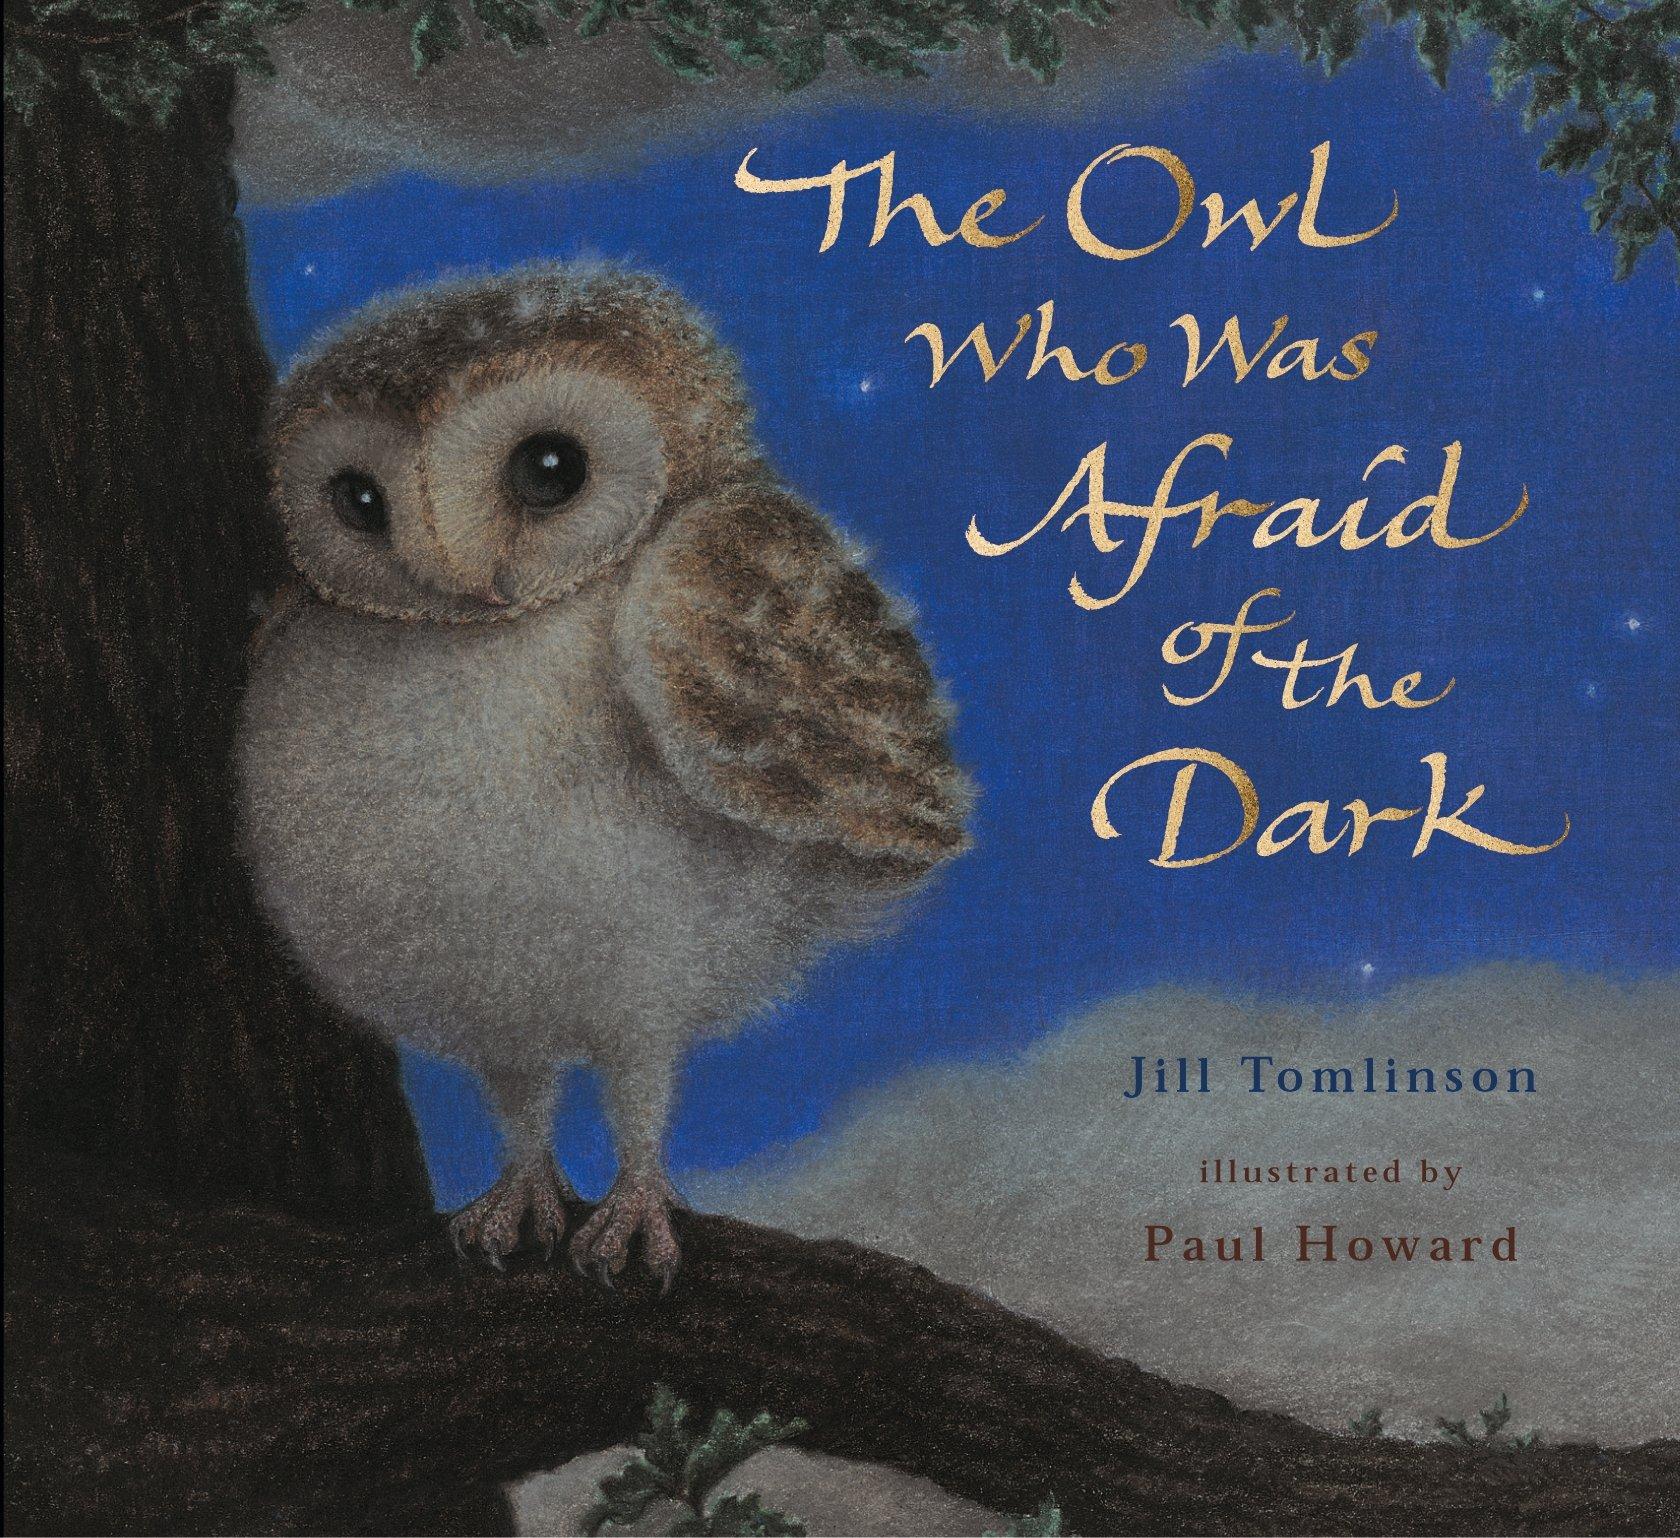 The Owl Who Was Afraid of the Dark: Amazon.co.uk: Tomlinson, Jill, Howard,  Paul: 9781405201773: Books